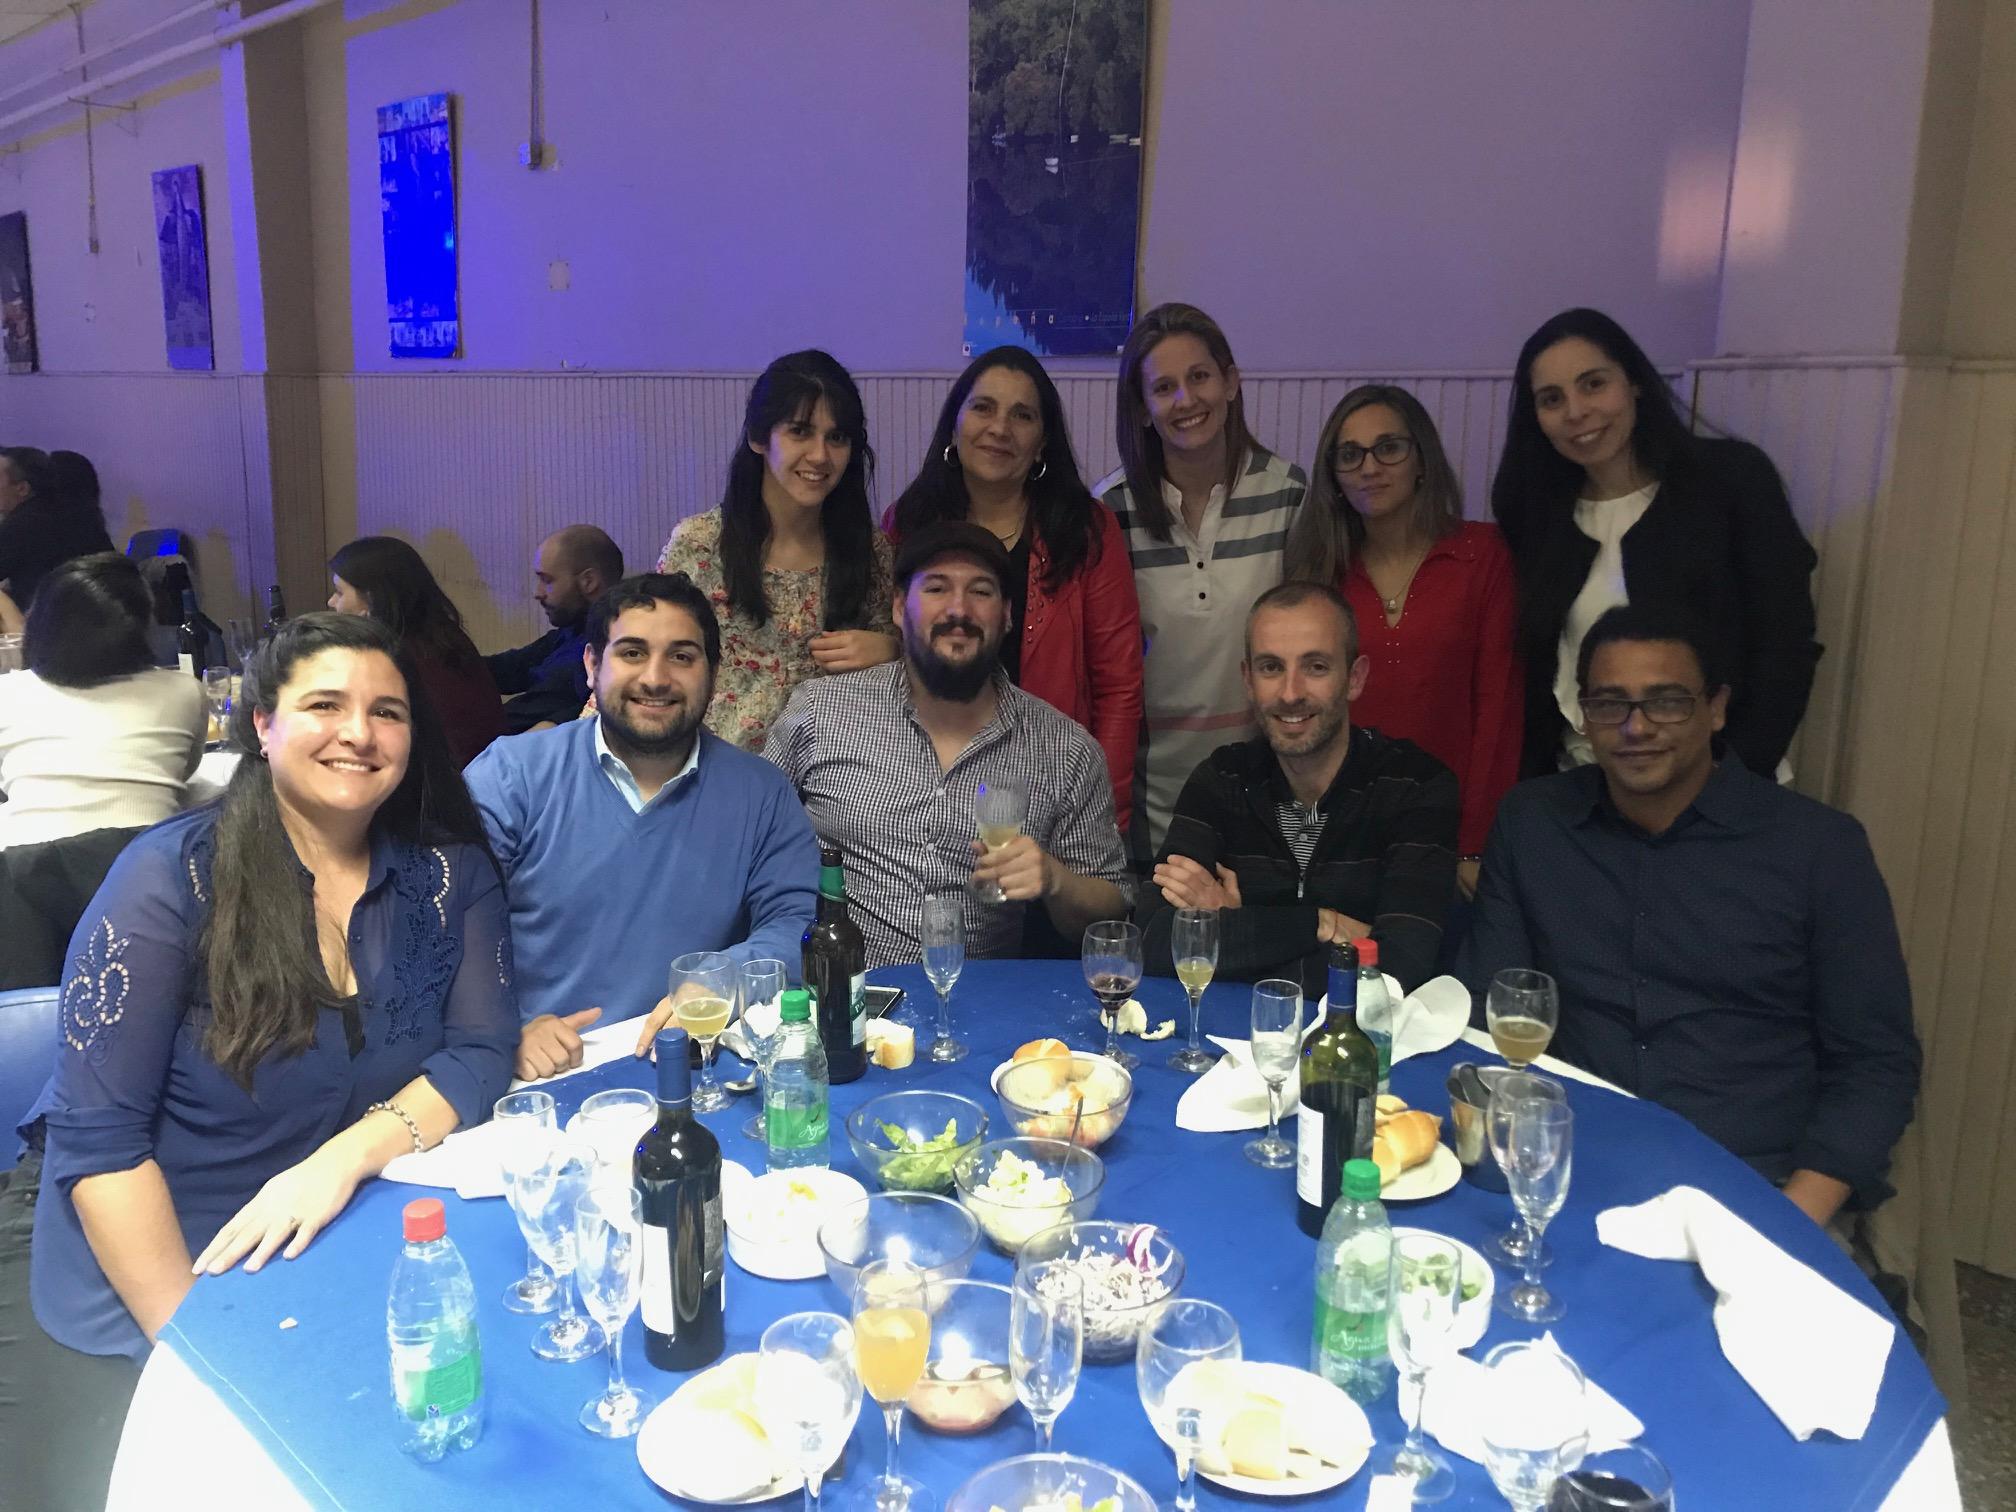 Cena congreso AAQA La Pampa 2019